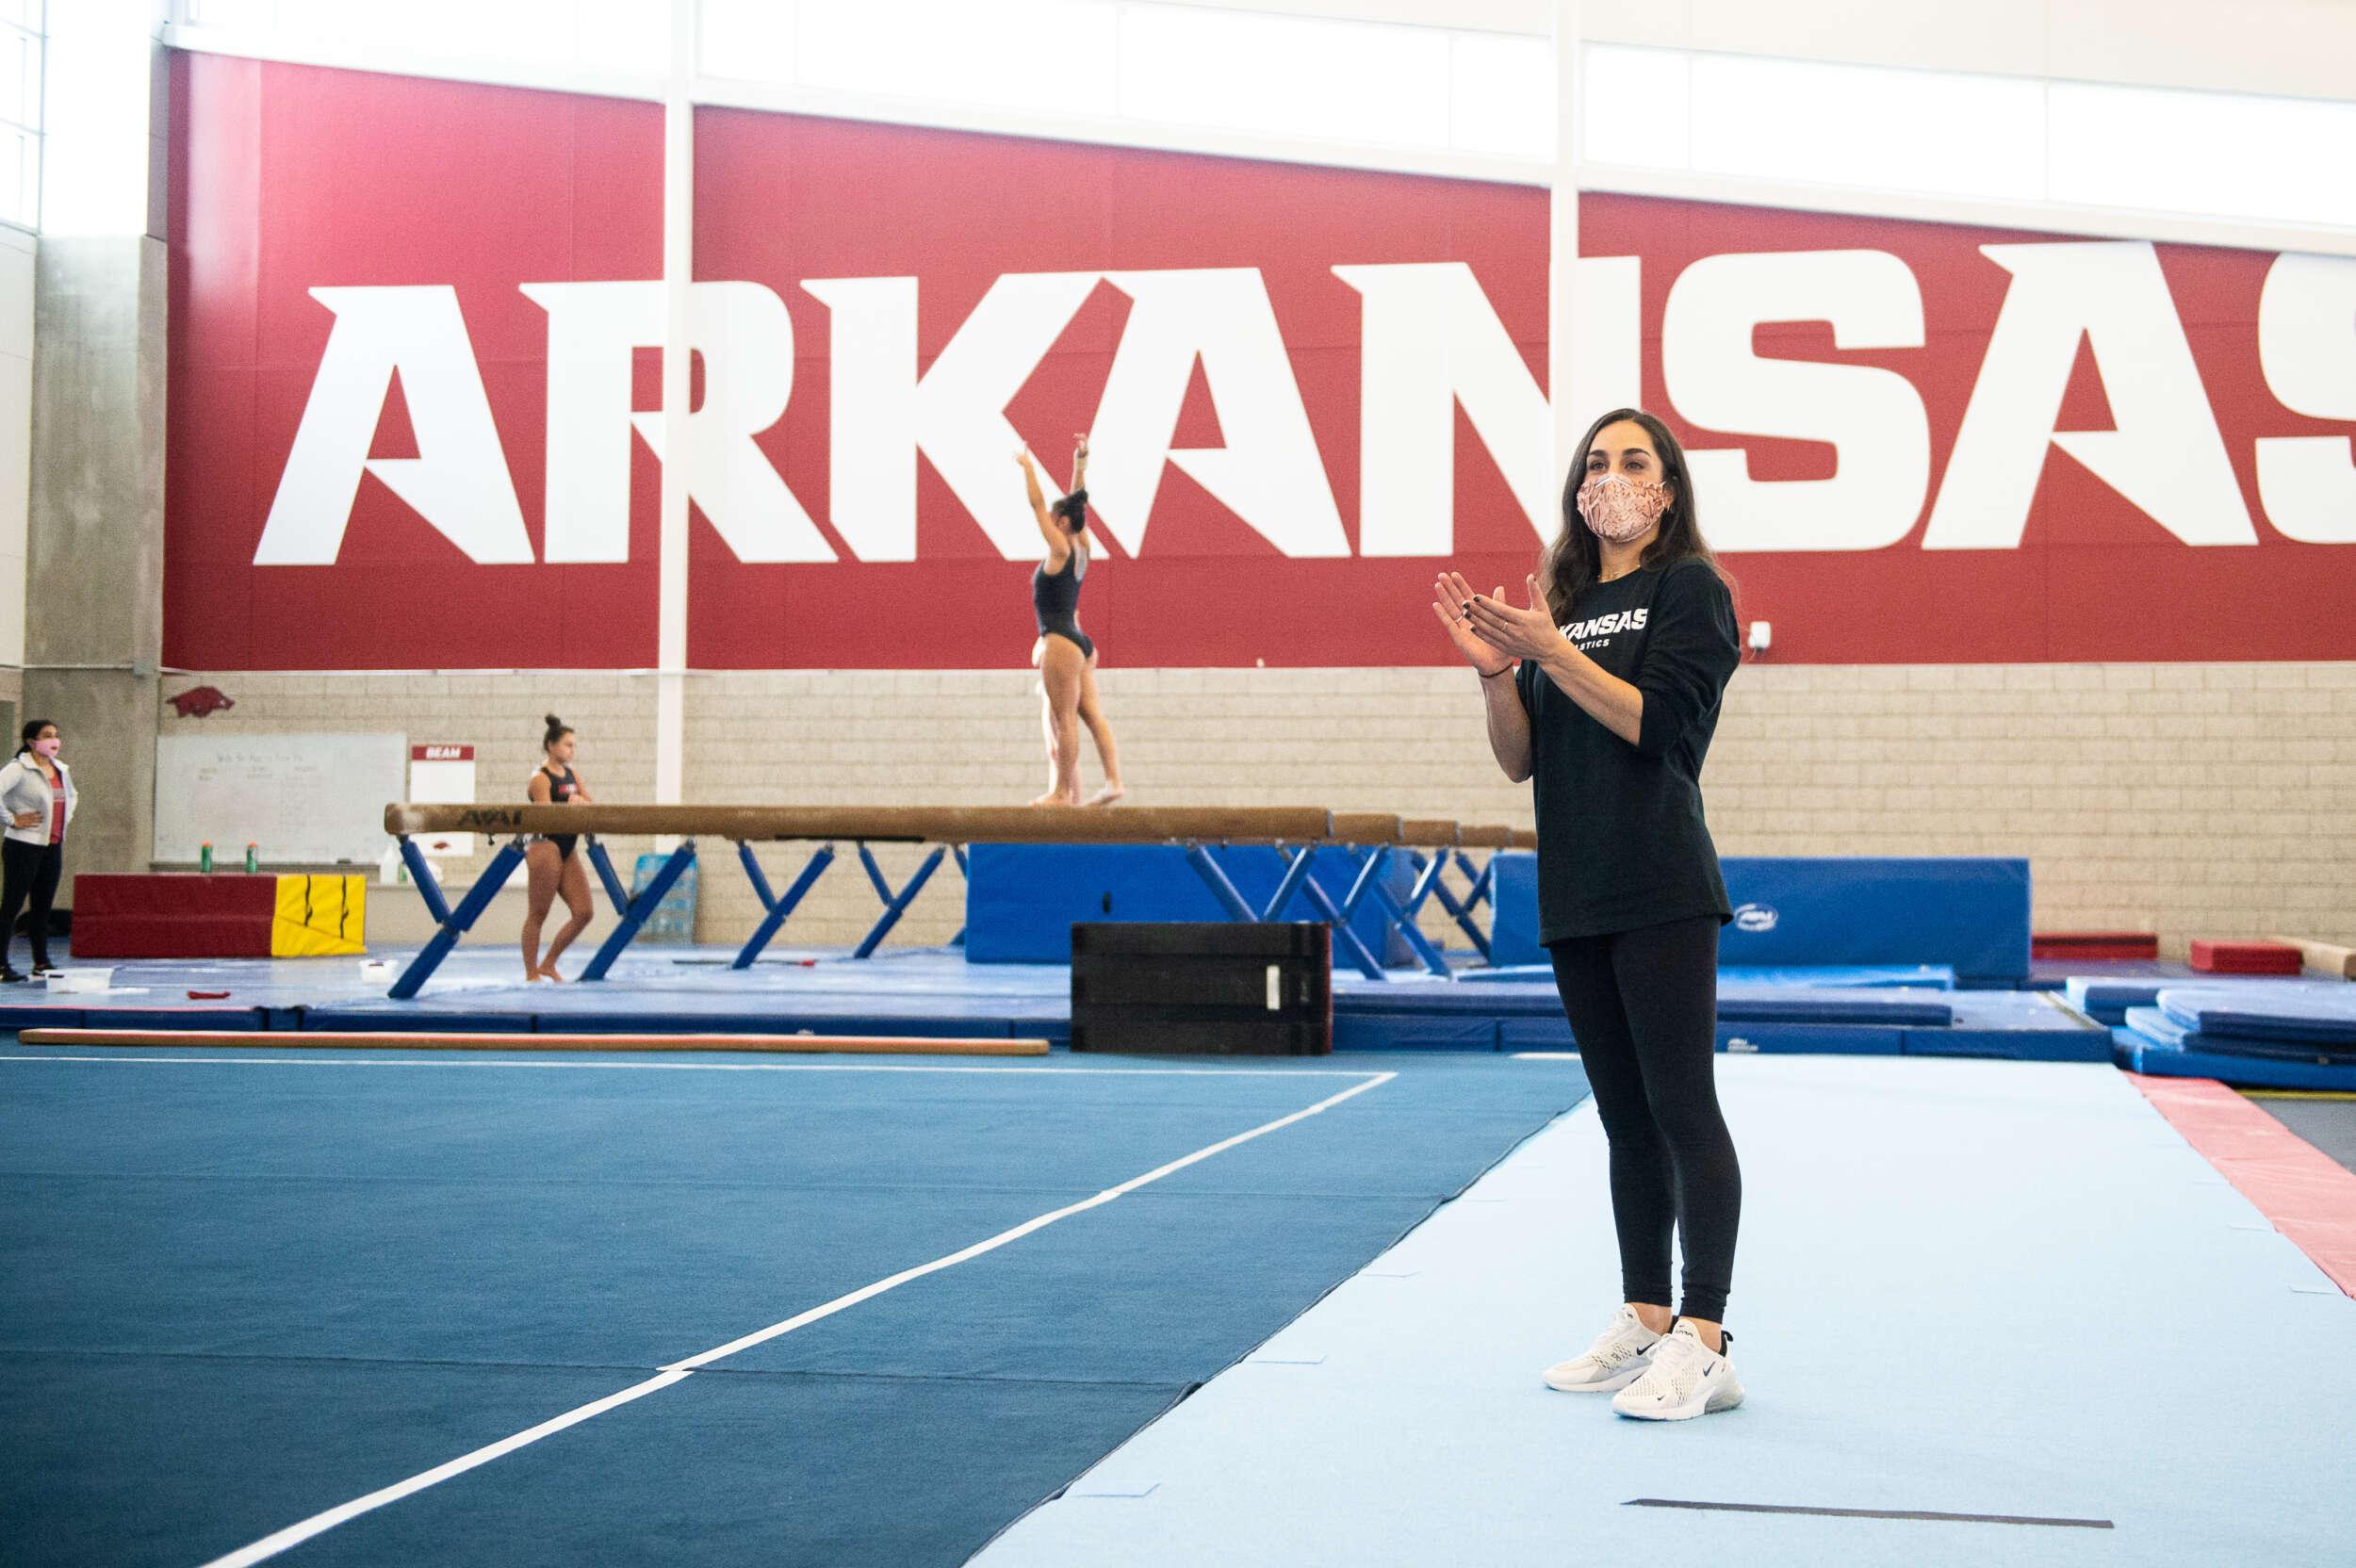 Arkansas Gymnastics Invites Season Ticket Holders to Renew for 2021 Season